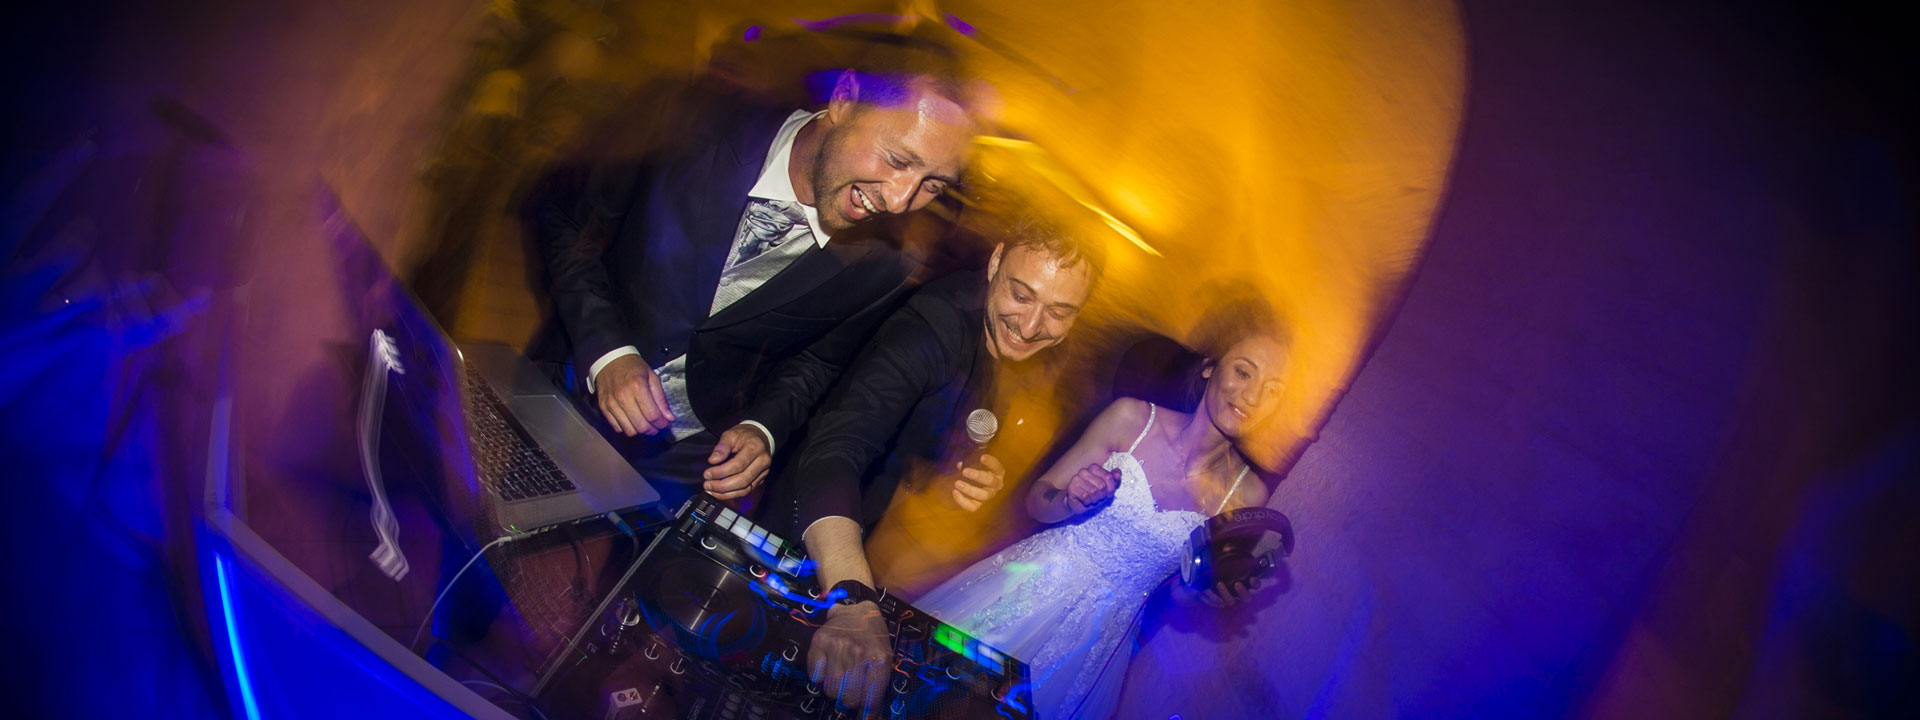 La Musica degli Sposi Felici & Danny Dj Matrimonio